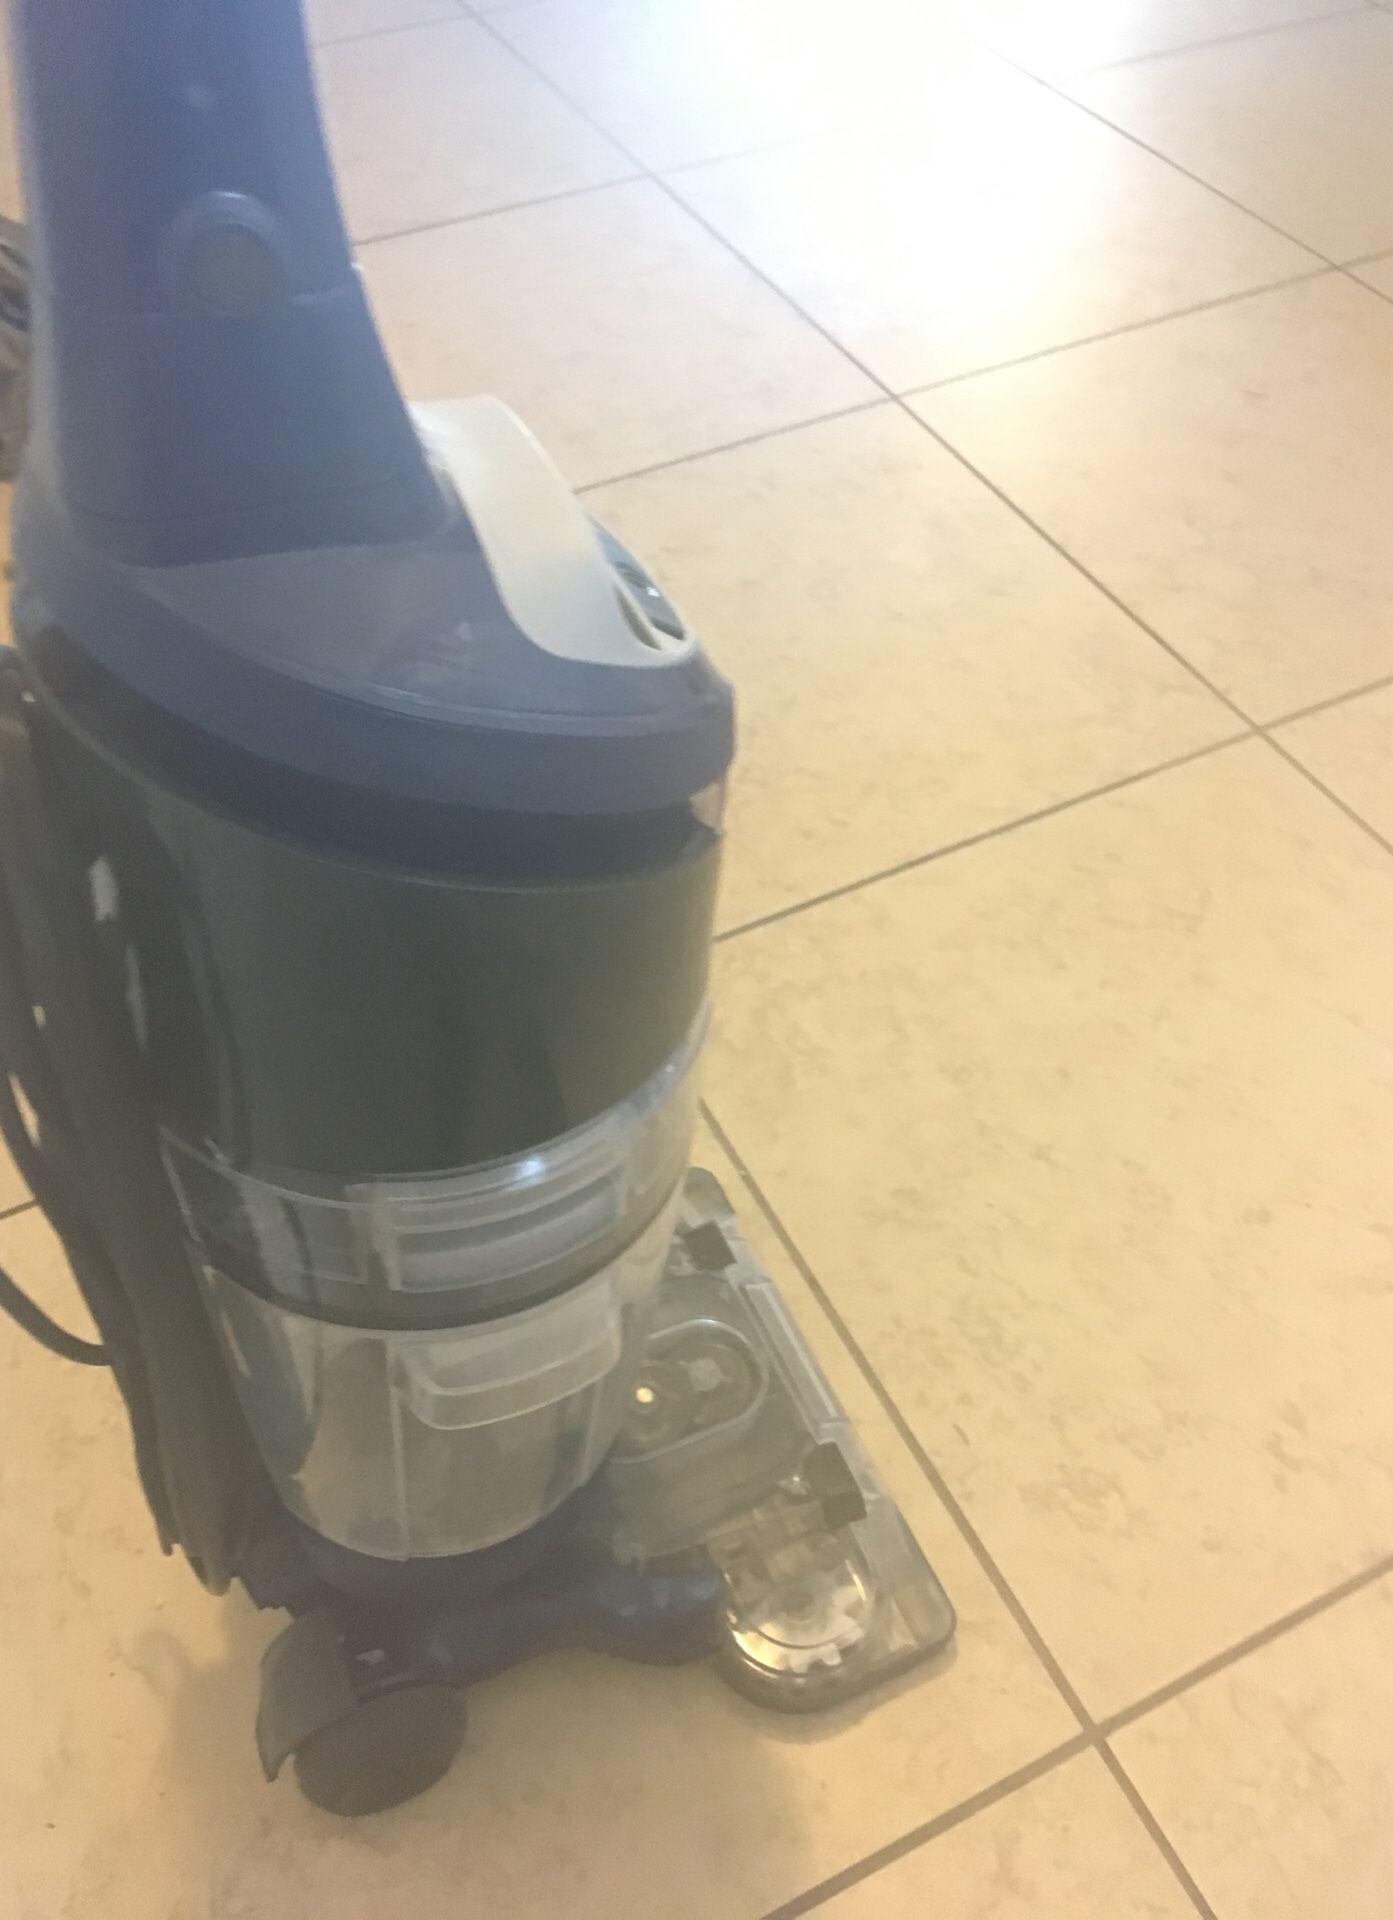 Oreck Floor cleaner FREE (doesn't start)